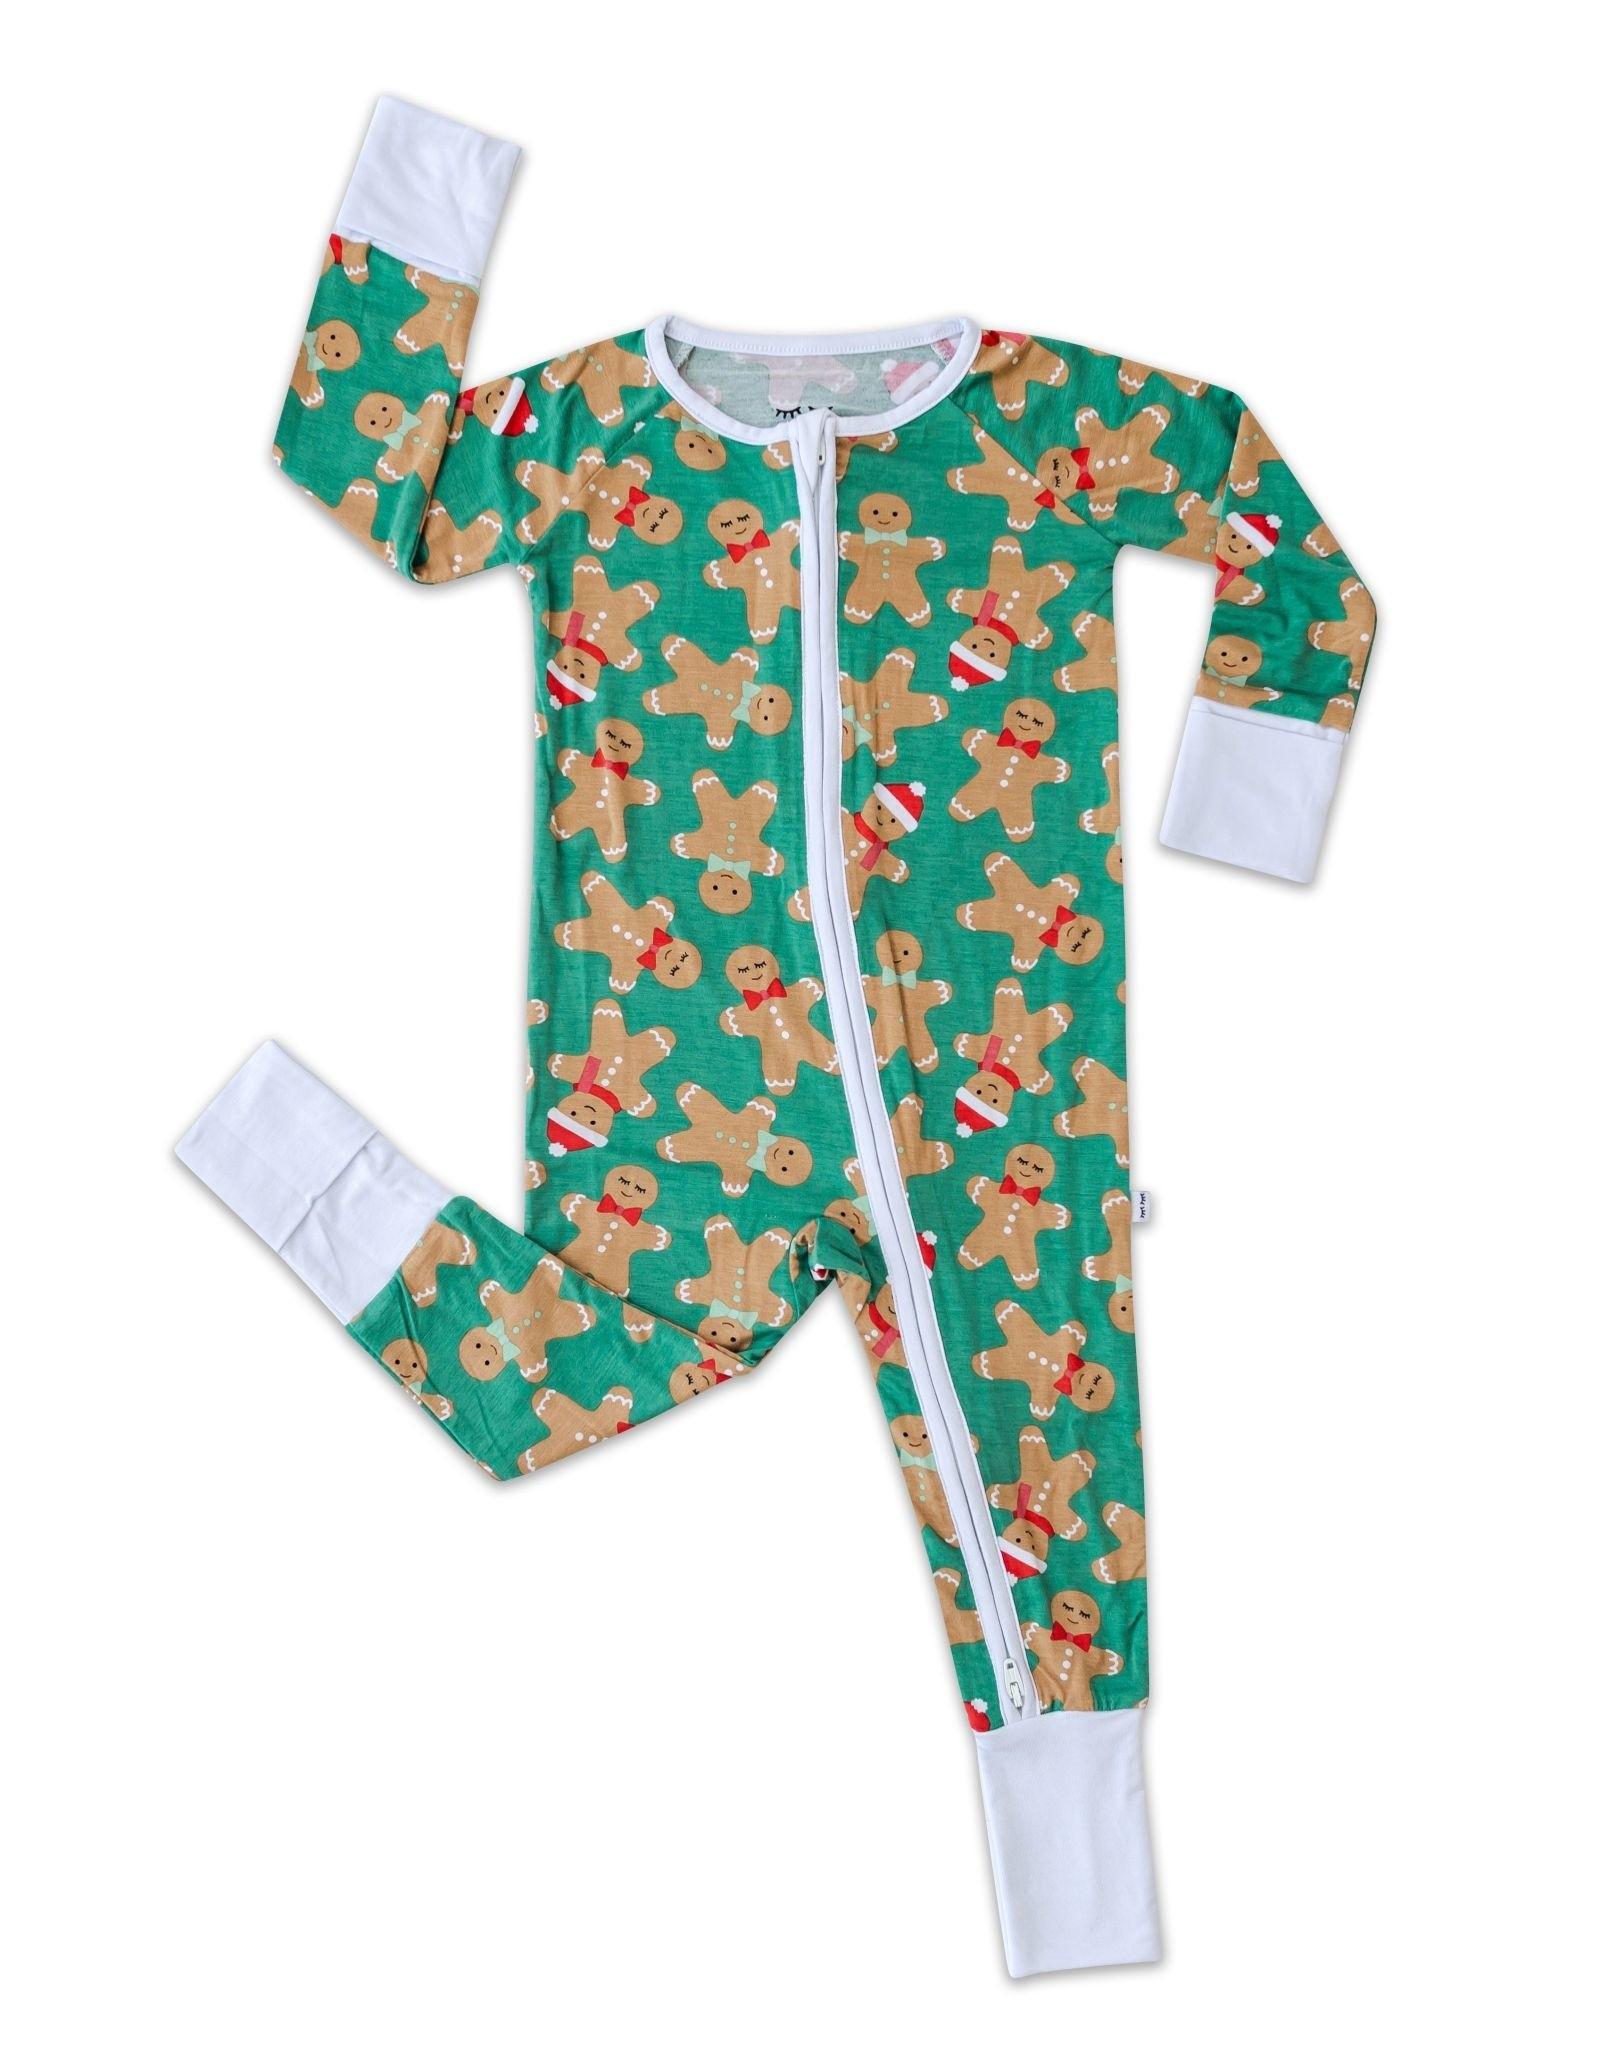 Little Sleepies green gingerbread zippy